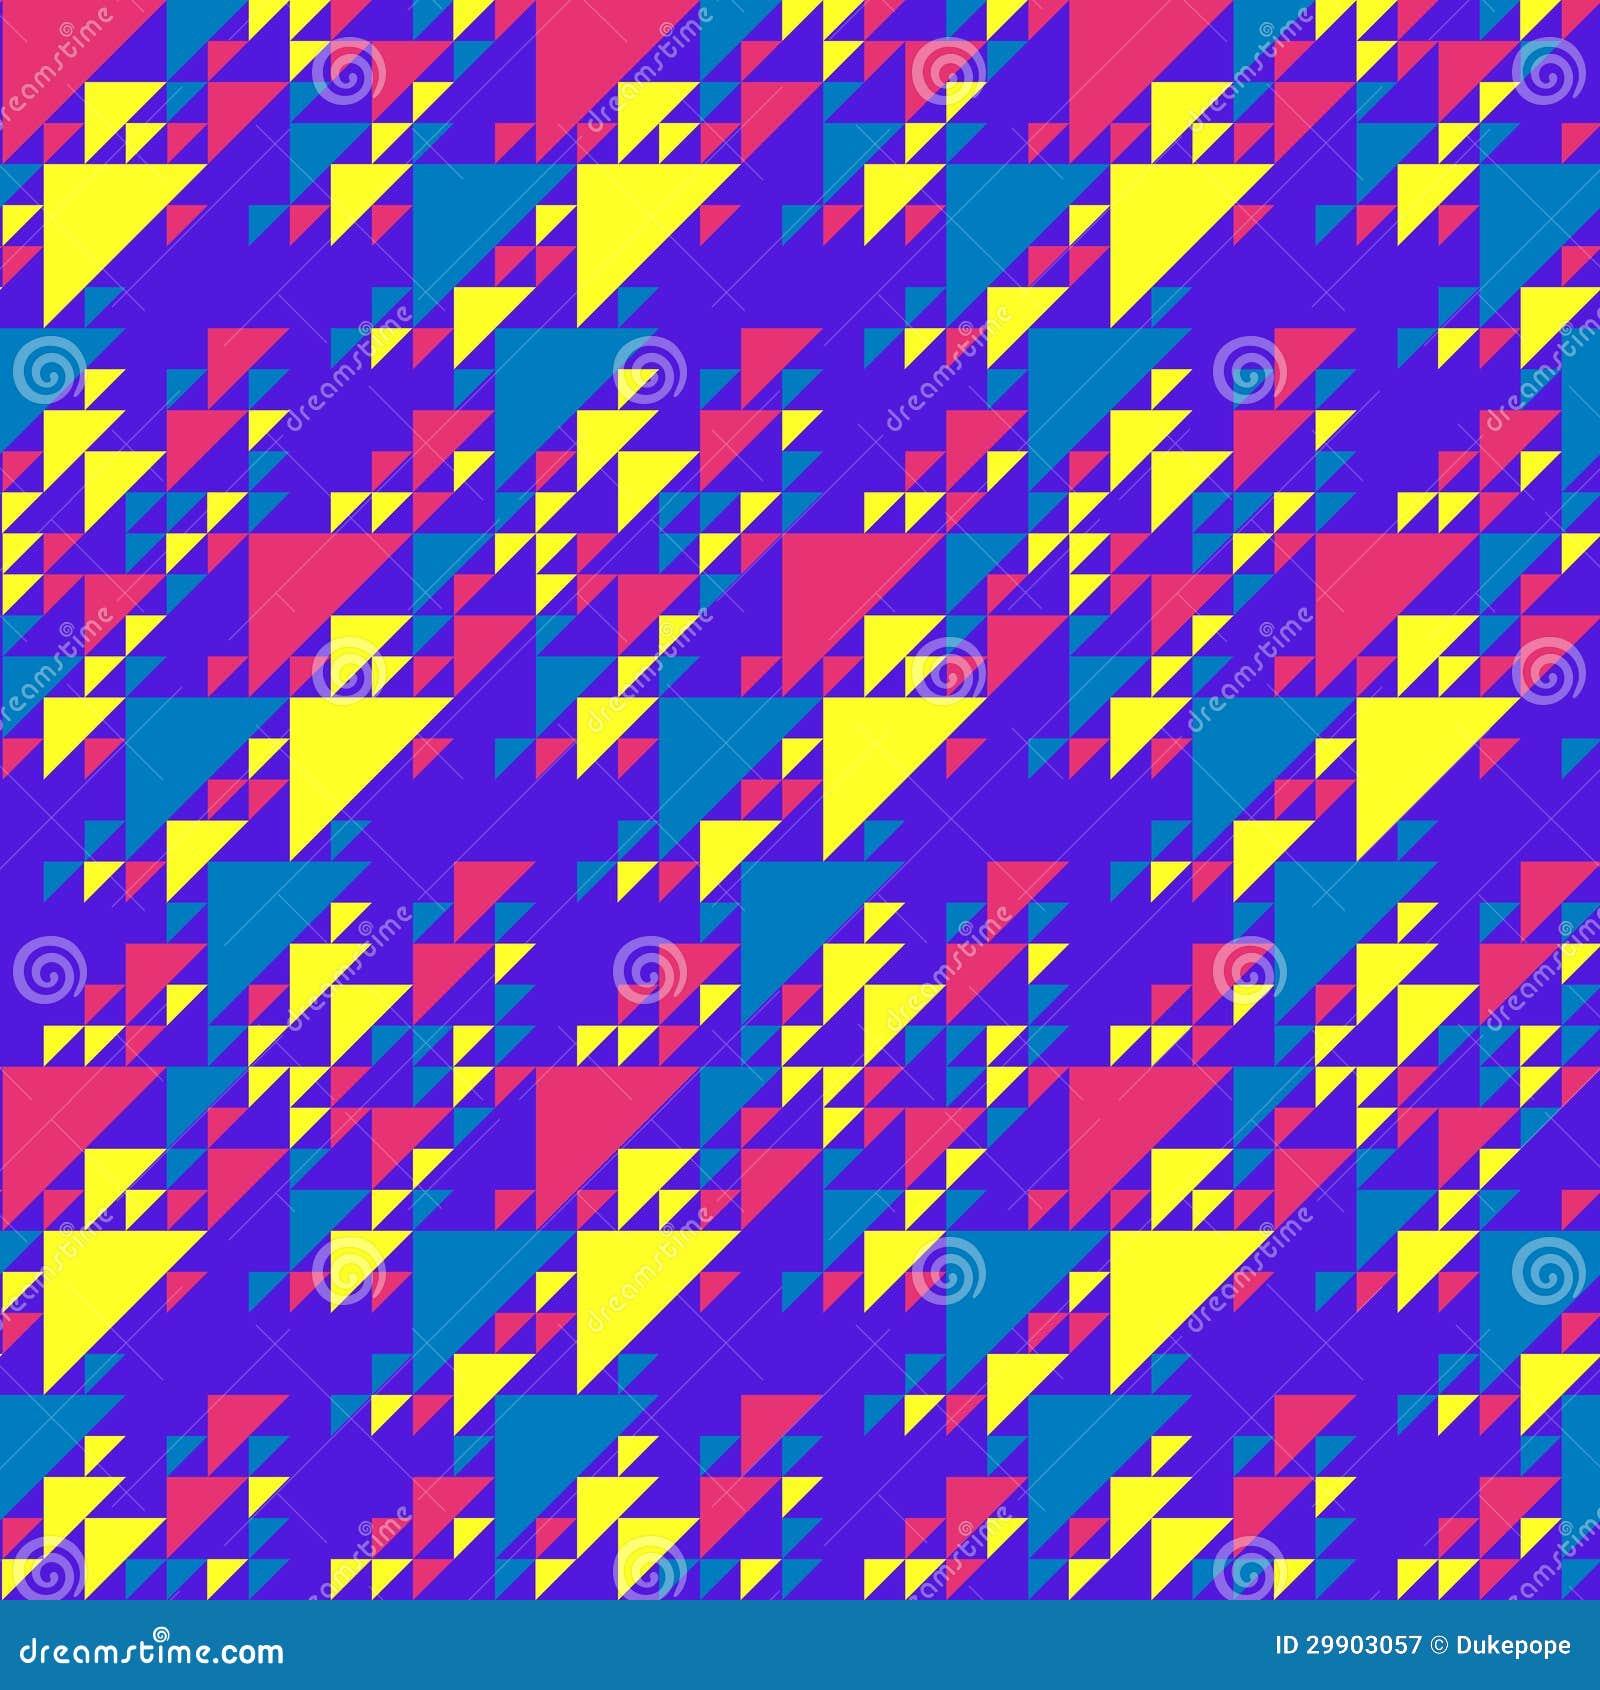 Retro Beach Illustration Royalty Free Stock Photo: Retro Triangles Background Stock Vector. Illustration Of